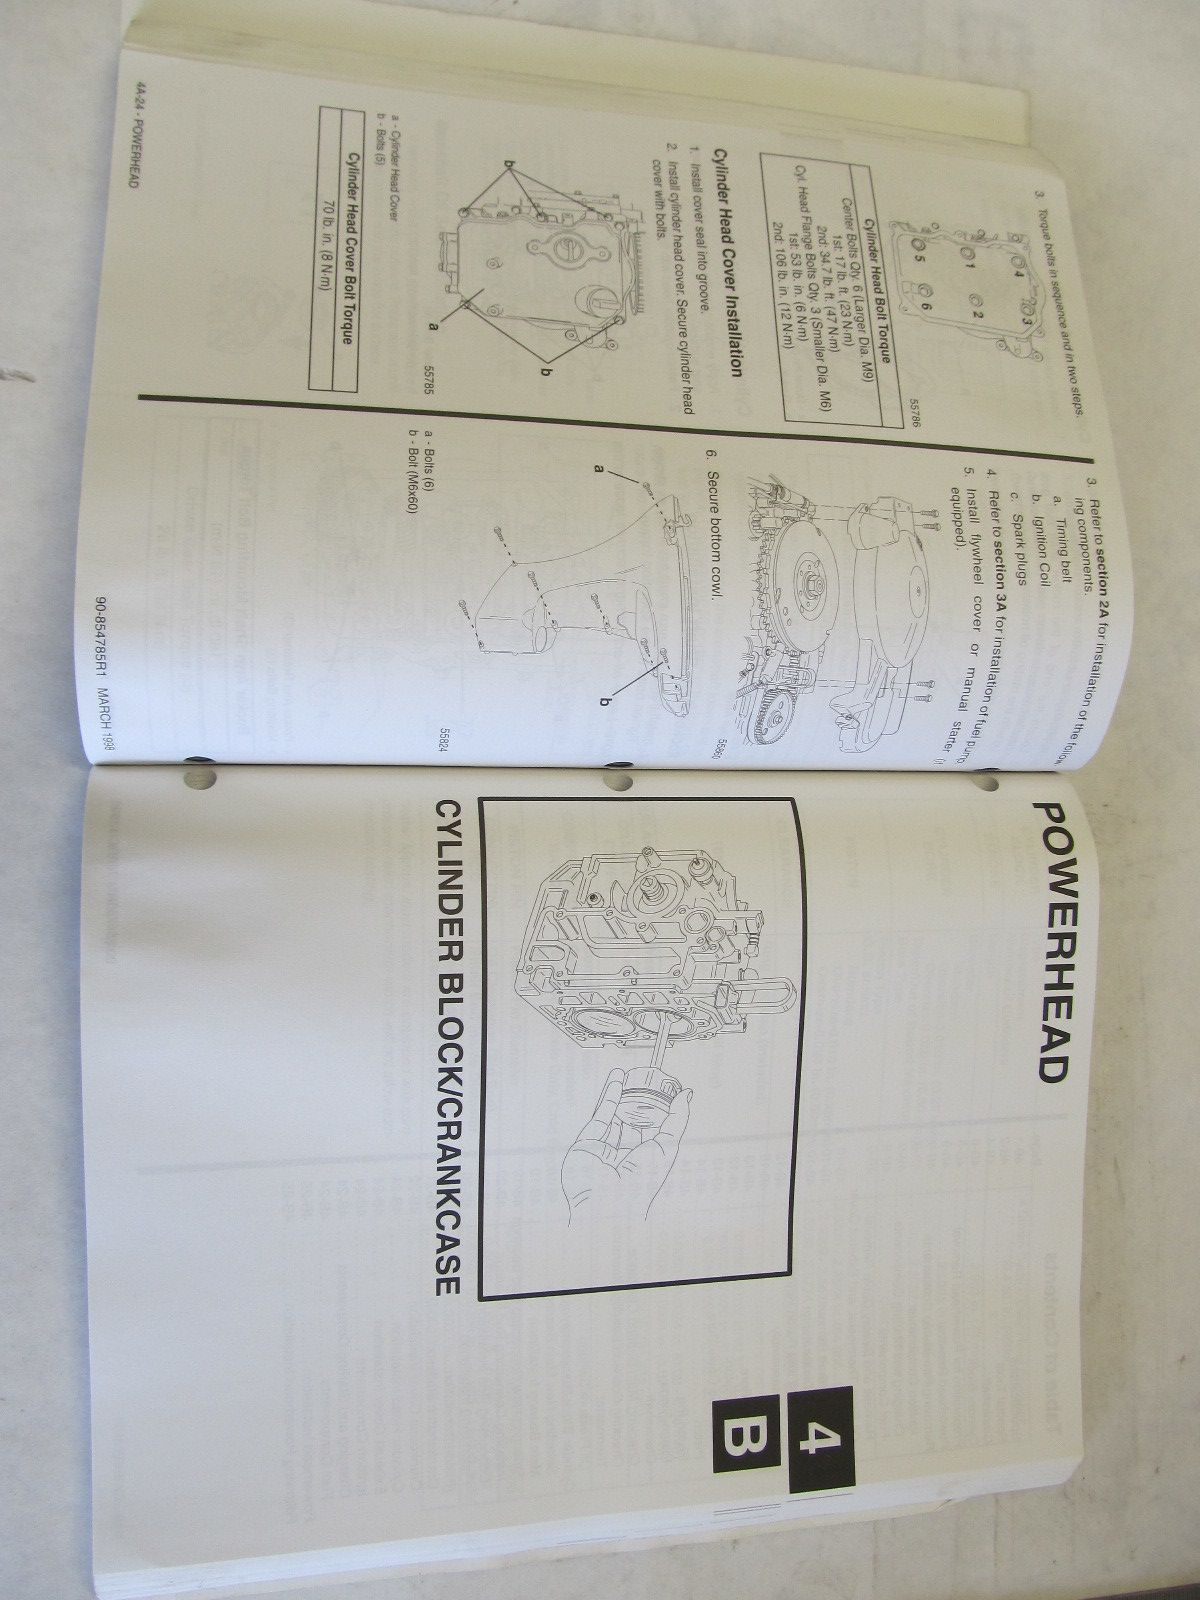 Crestliner Wiring Diagram 25 Images Of Home Princecraft Engine Diagrams